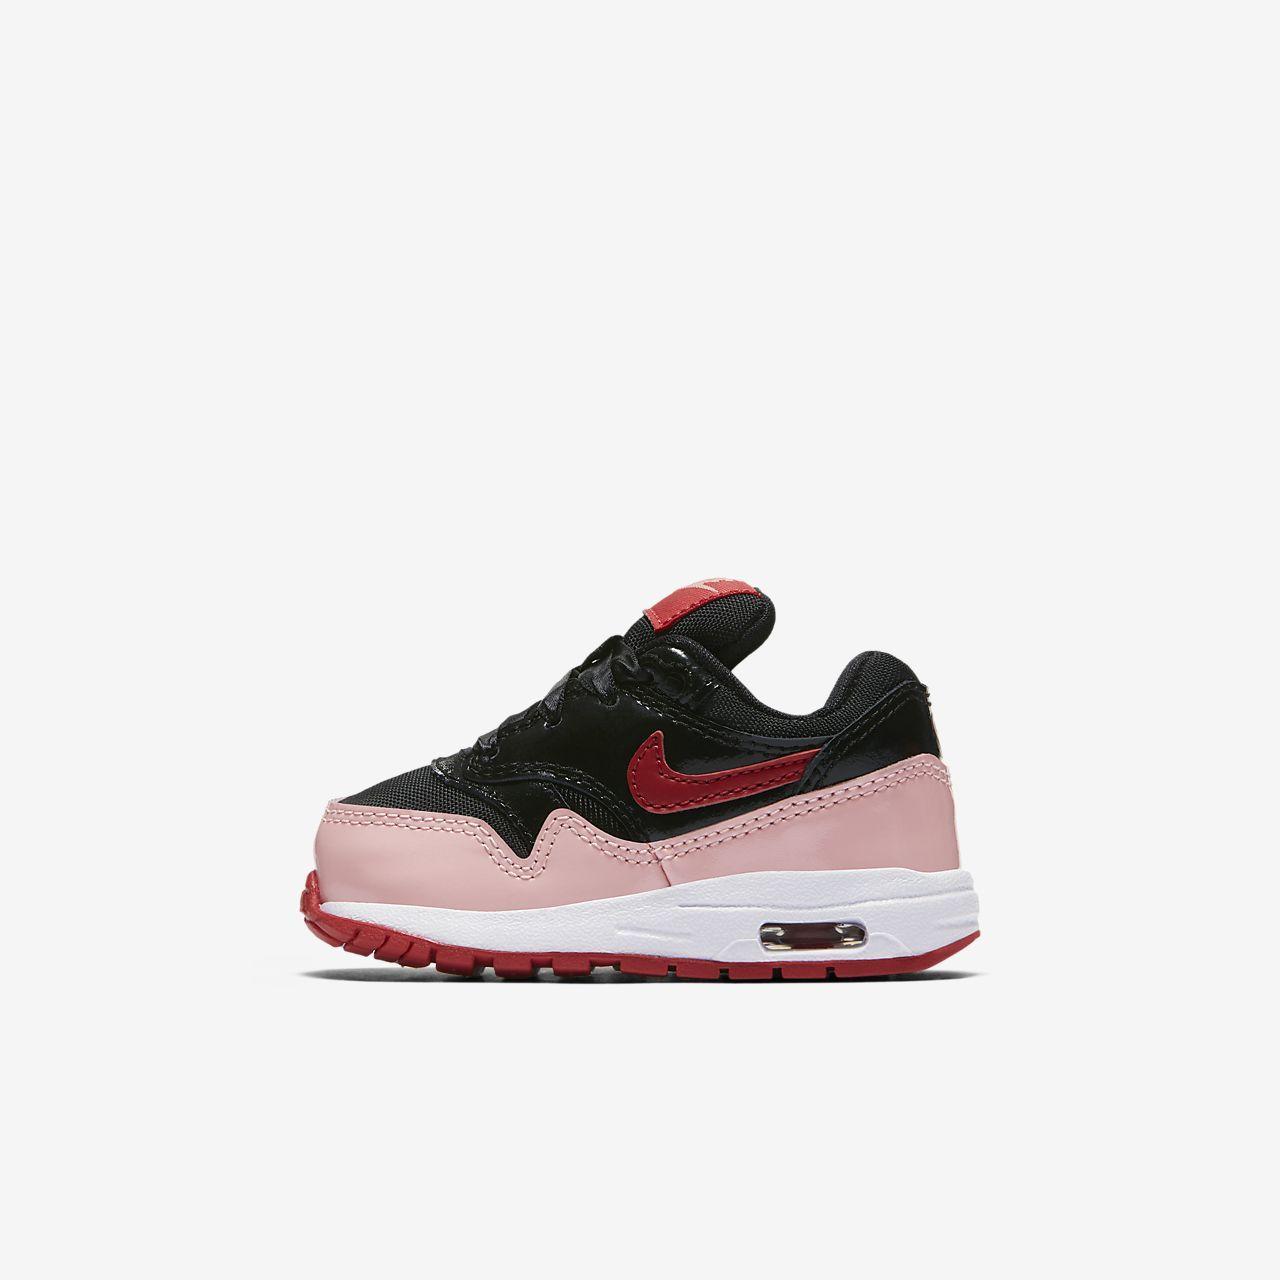 wholesale dealer 28bff 63001 Nike Air Max 1 QS Infant Toddler Shoe